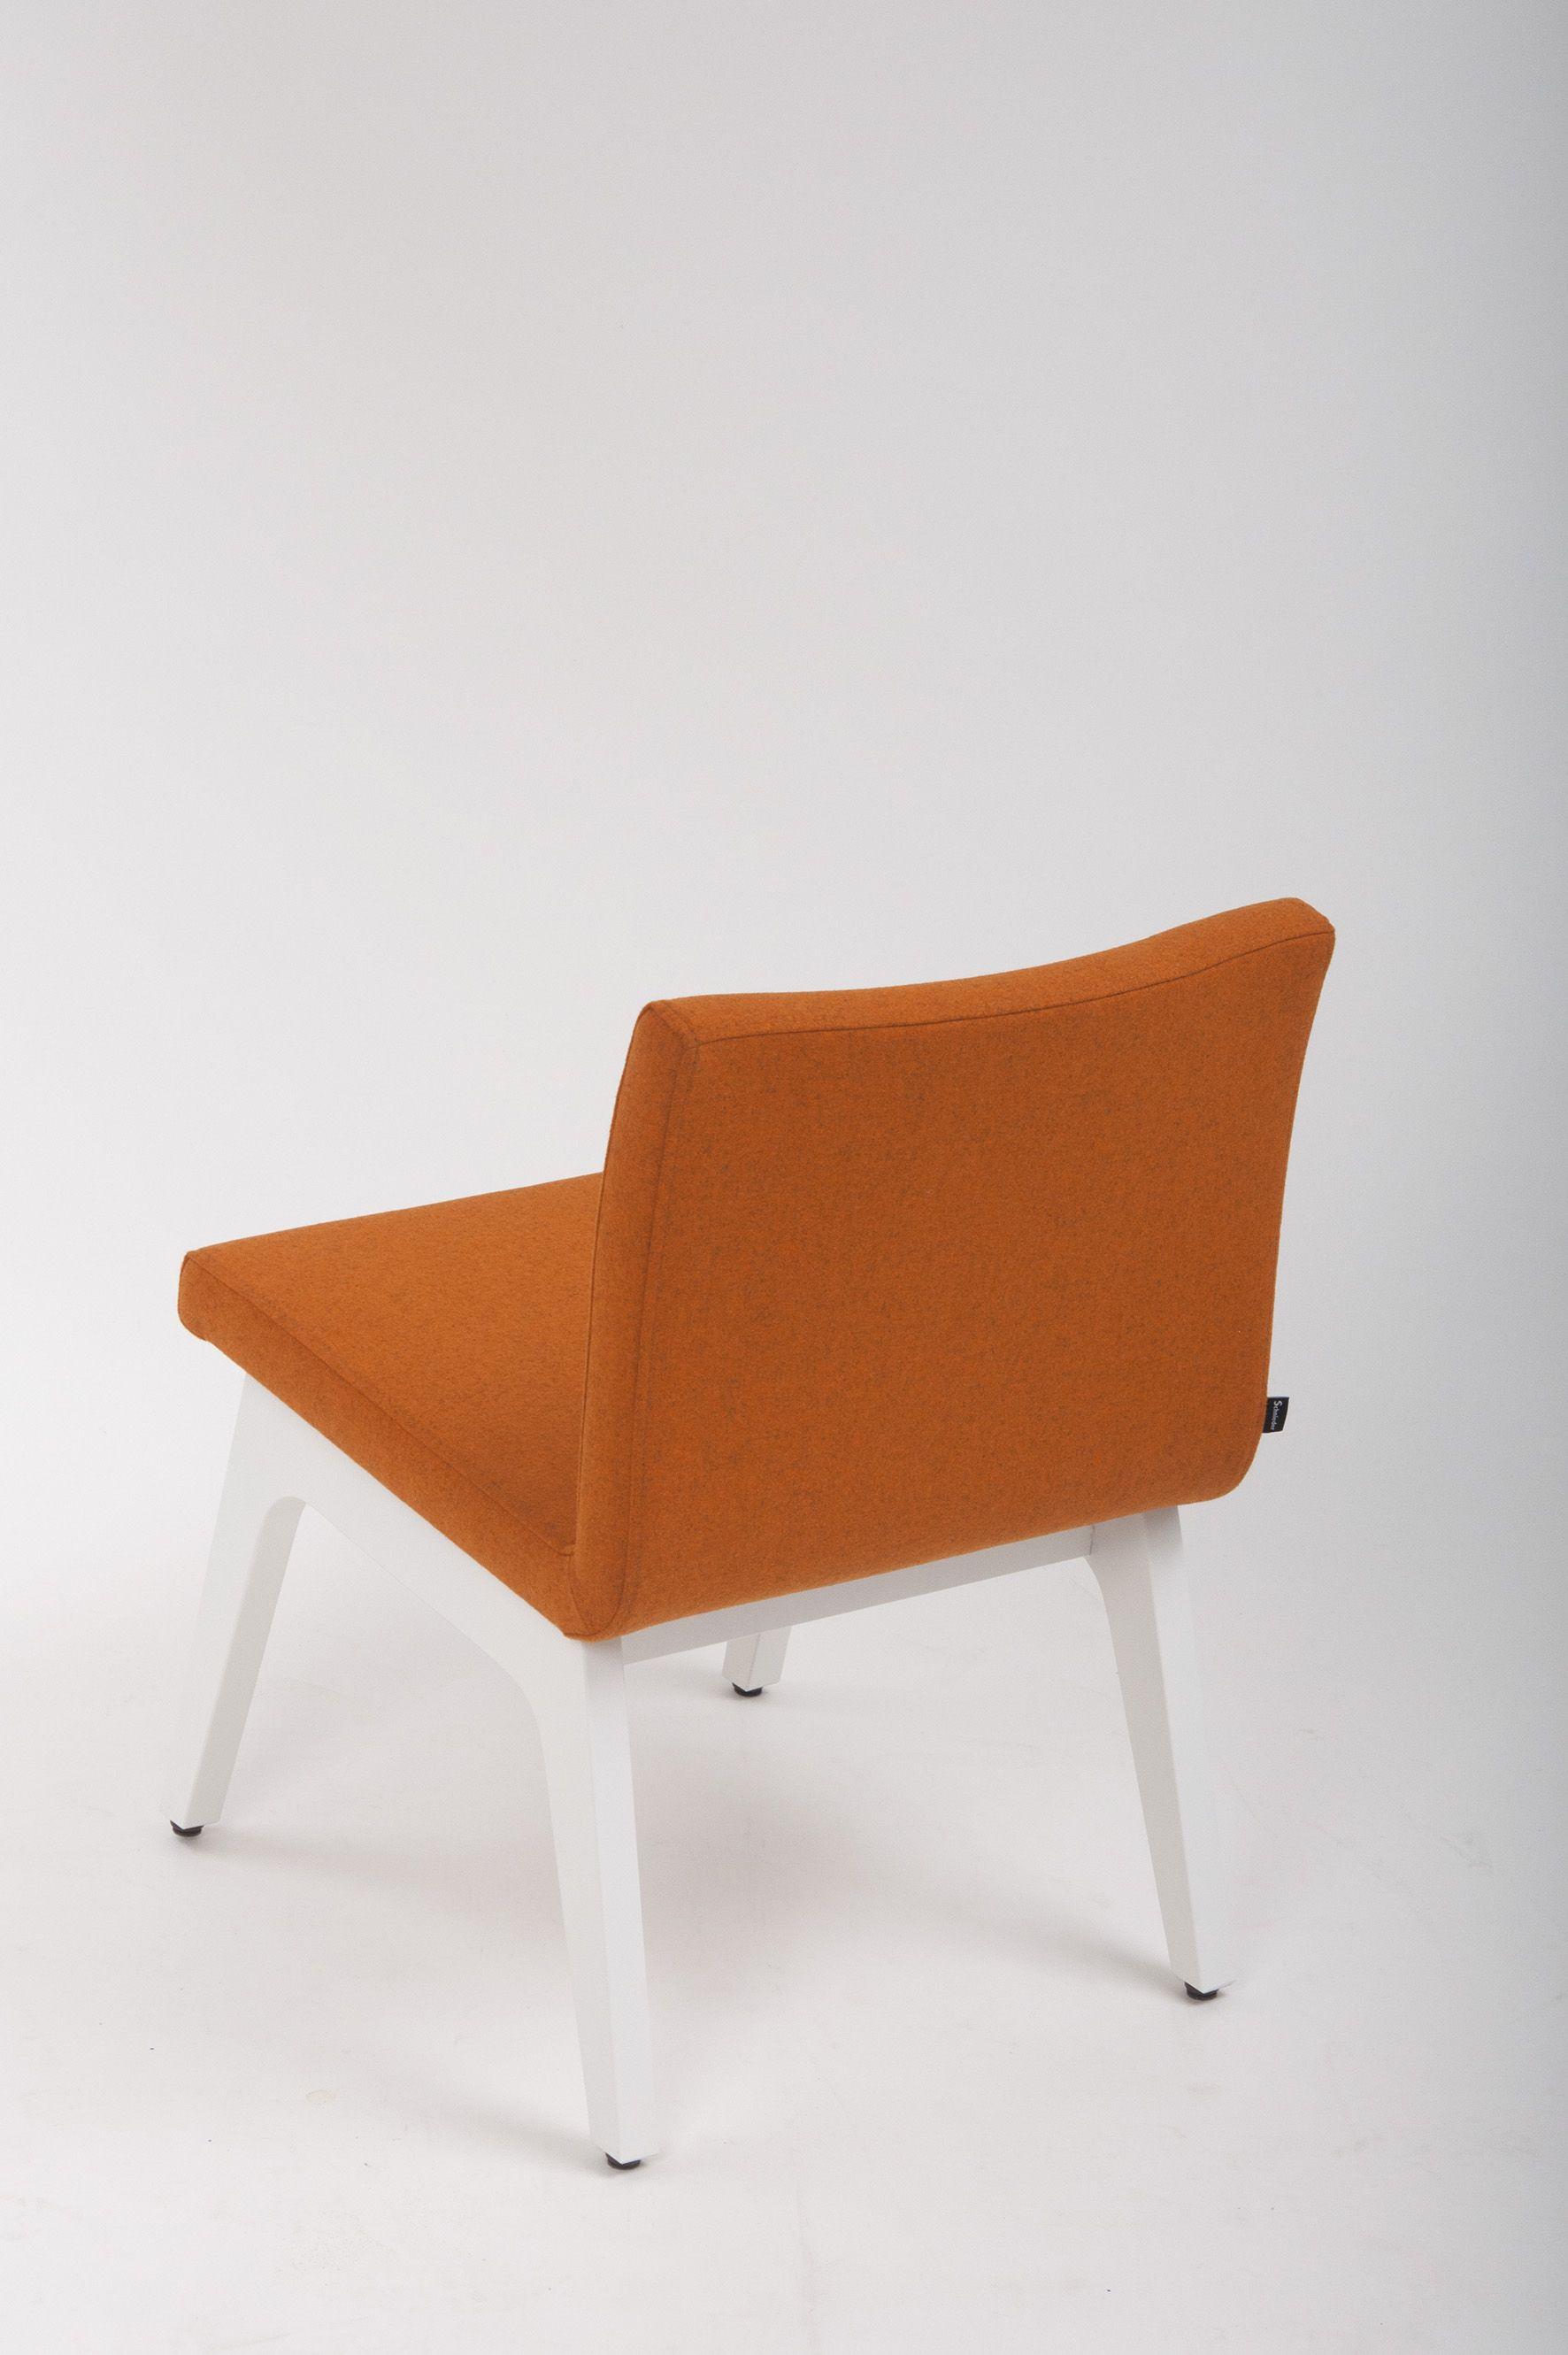 gastronomie mobel bestuhlung lounge mobel funktional entspannter sessel sitzen